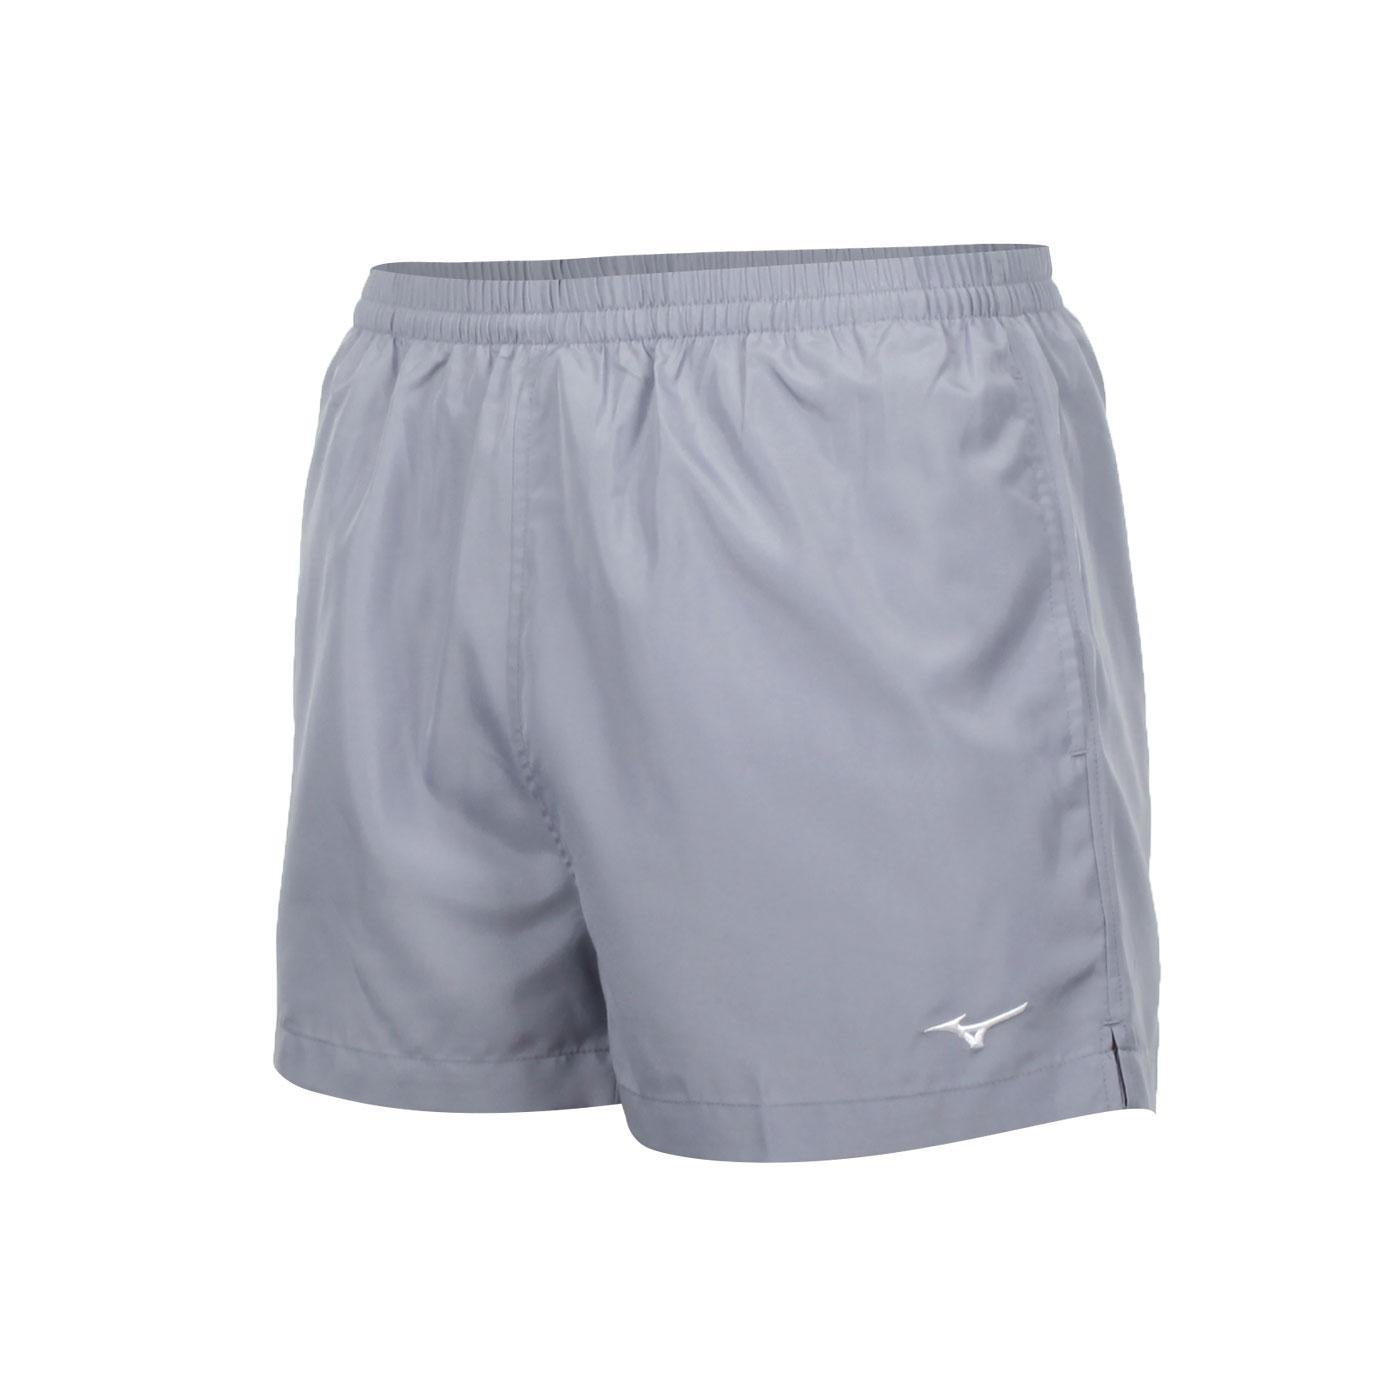 MIZUNO 路跑短褲 J2TB8A0105 - 鐵灰白